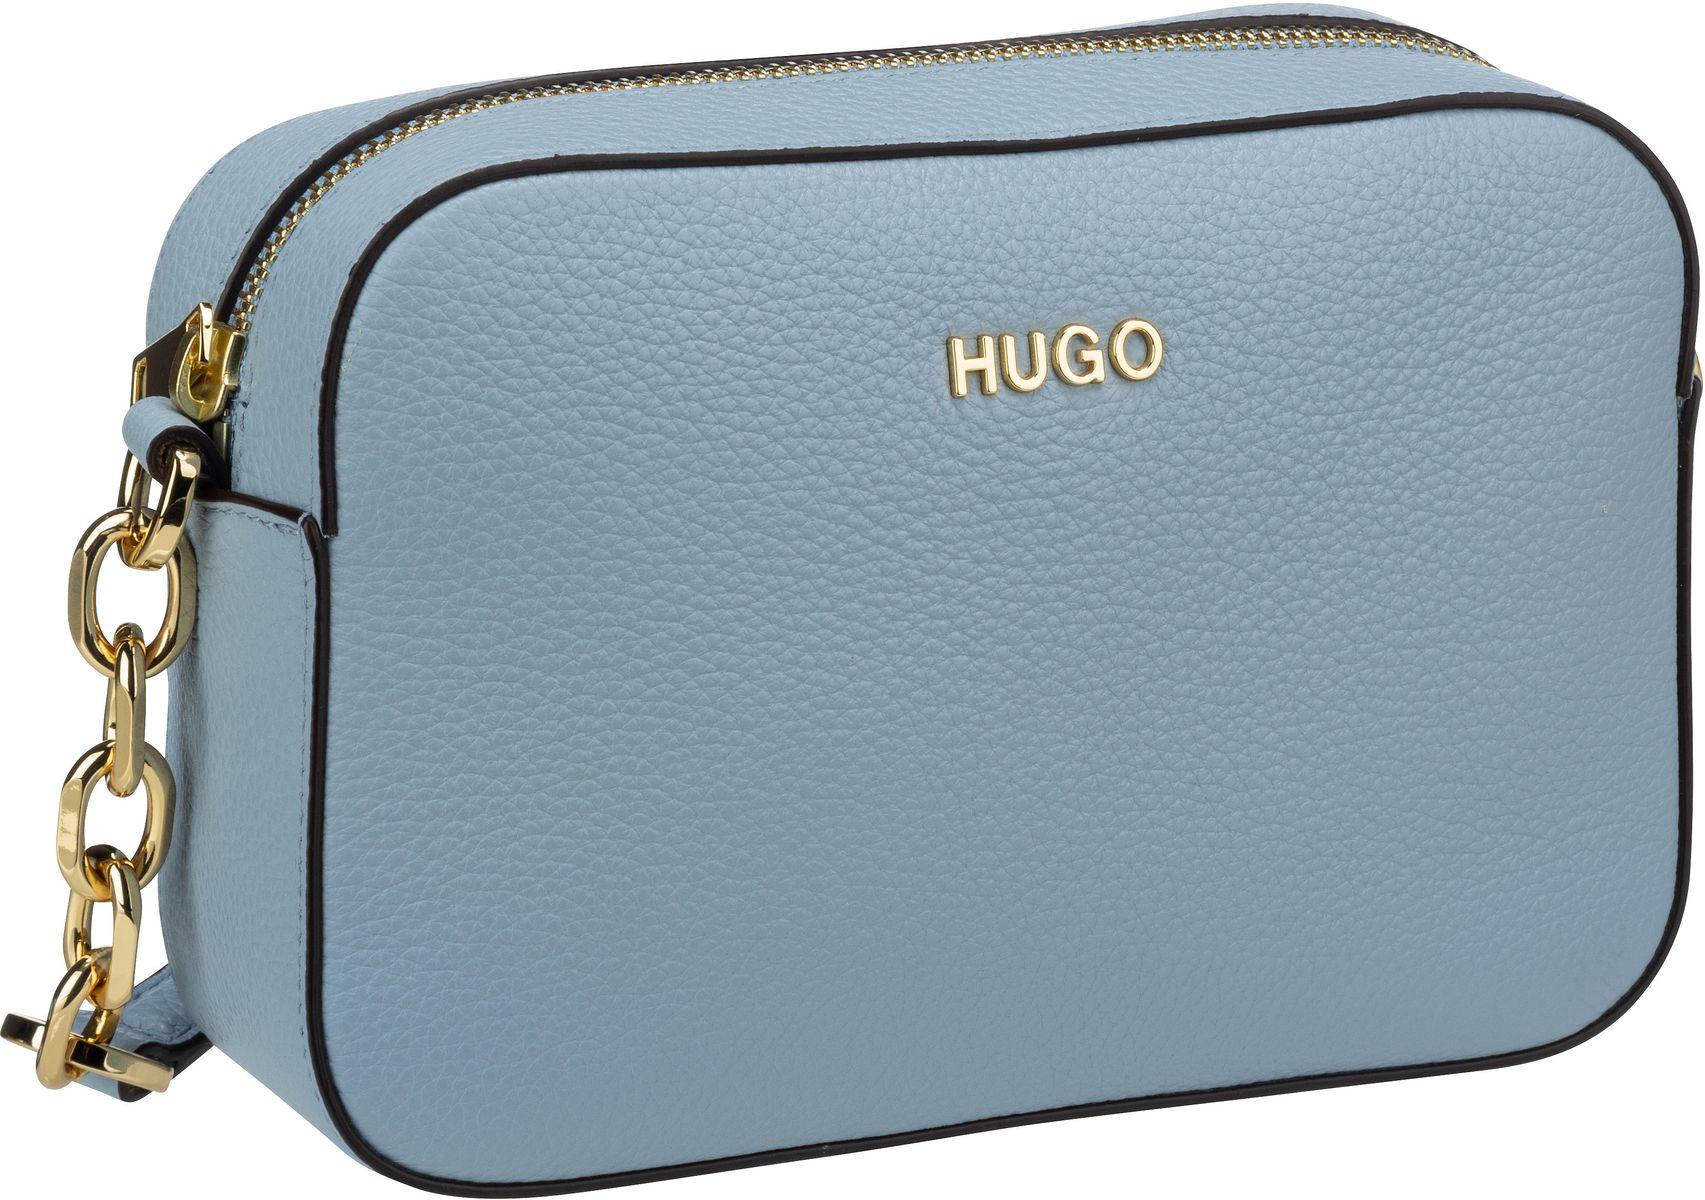 HUGO Umhängetasche Victoria Crossbody 428518 Light/Pastel Blue